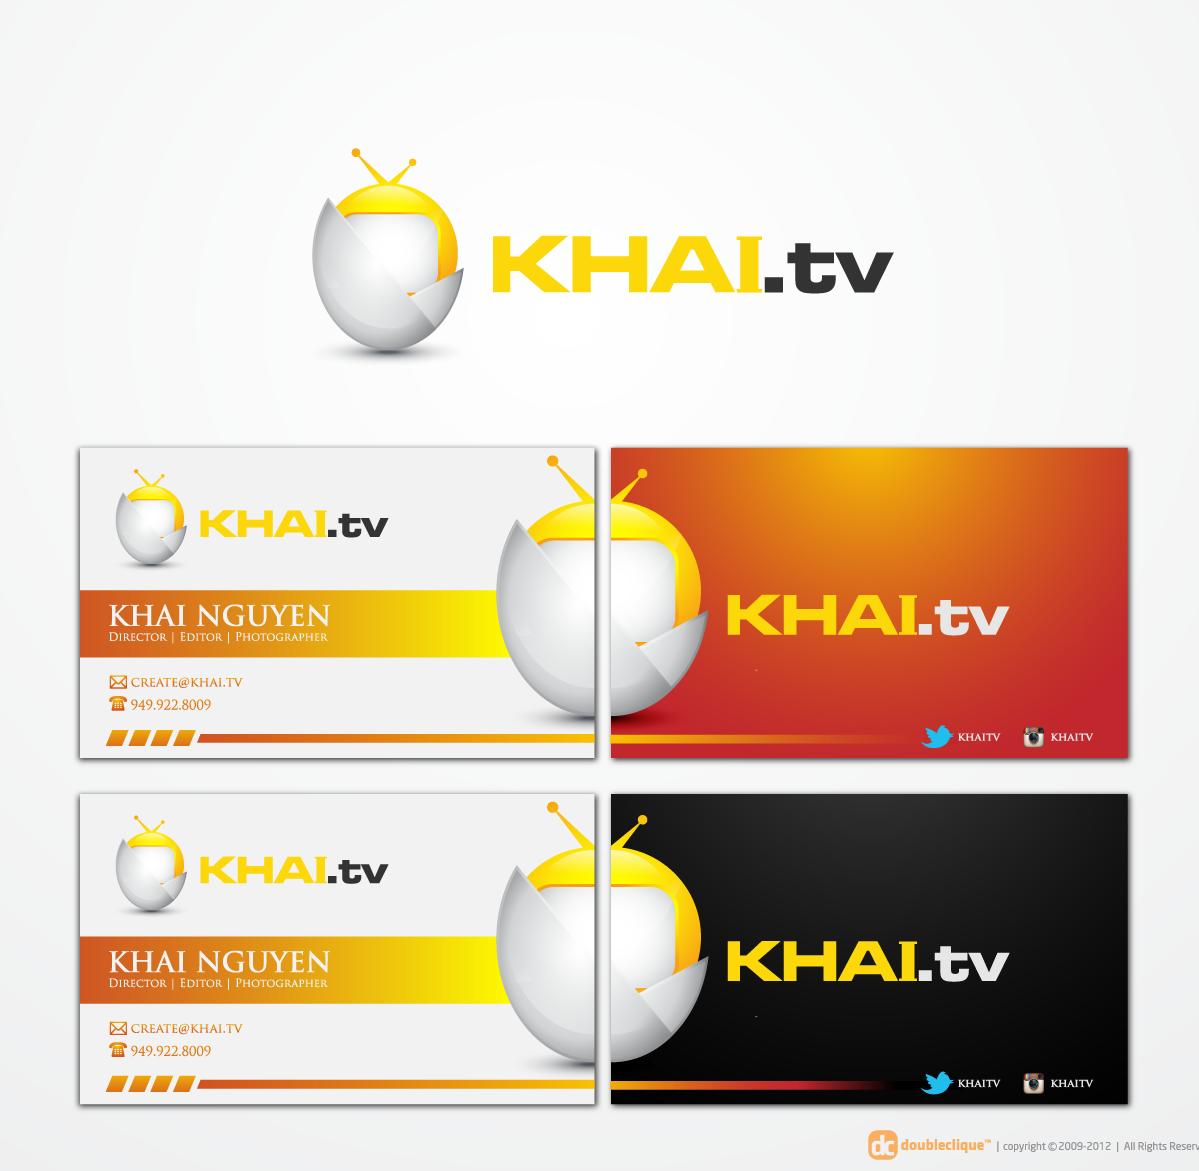 **CREATE an AWESOME logo/business card for KHAI.tv!